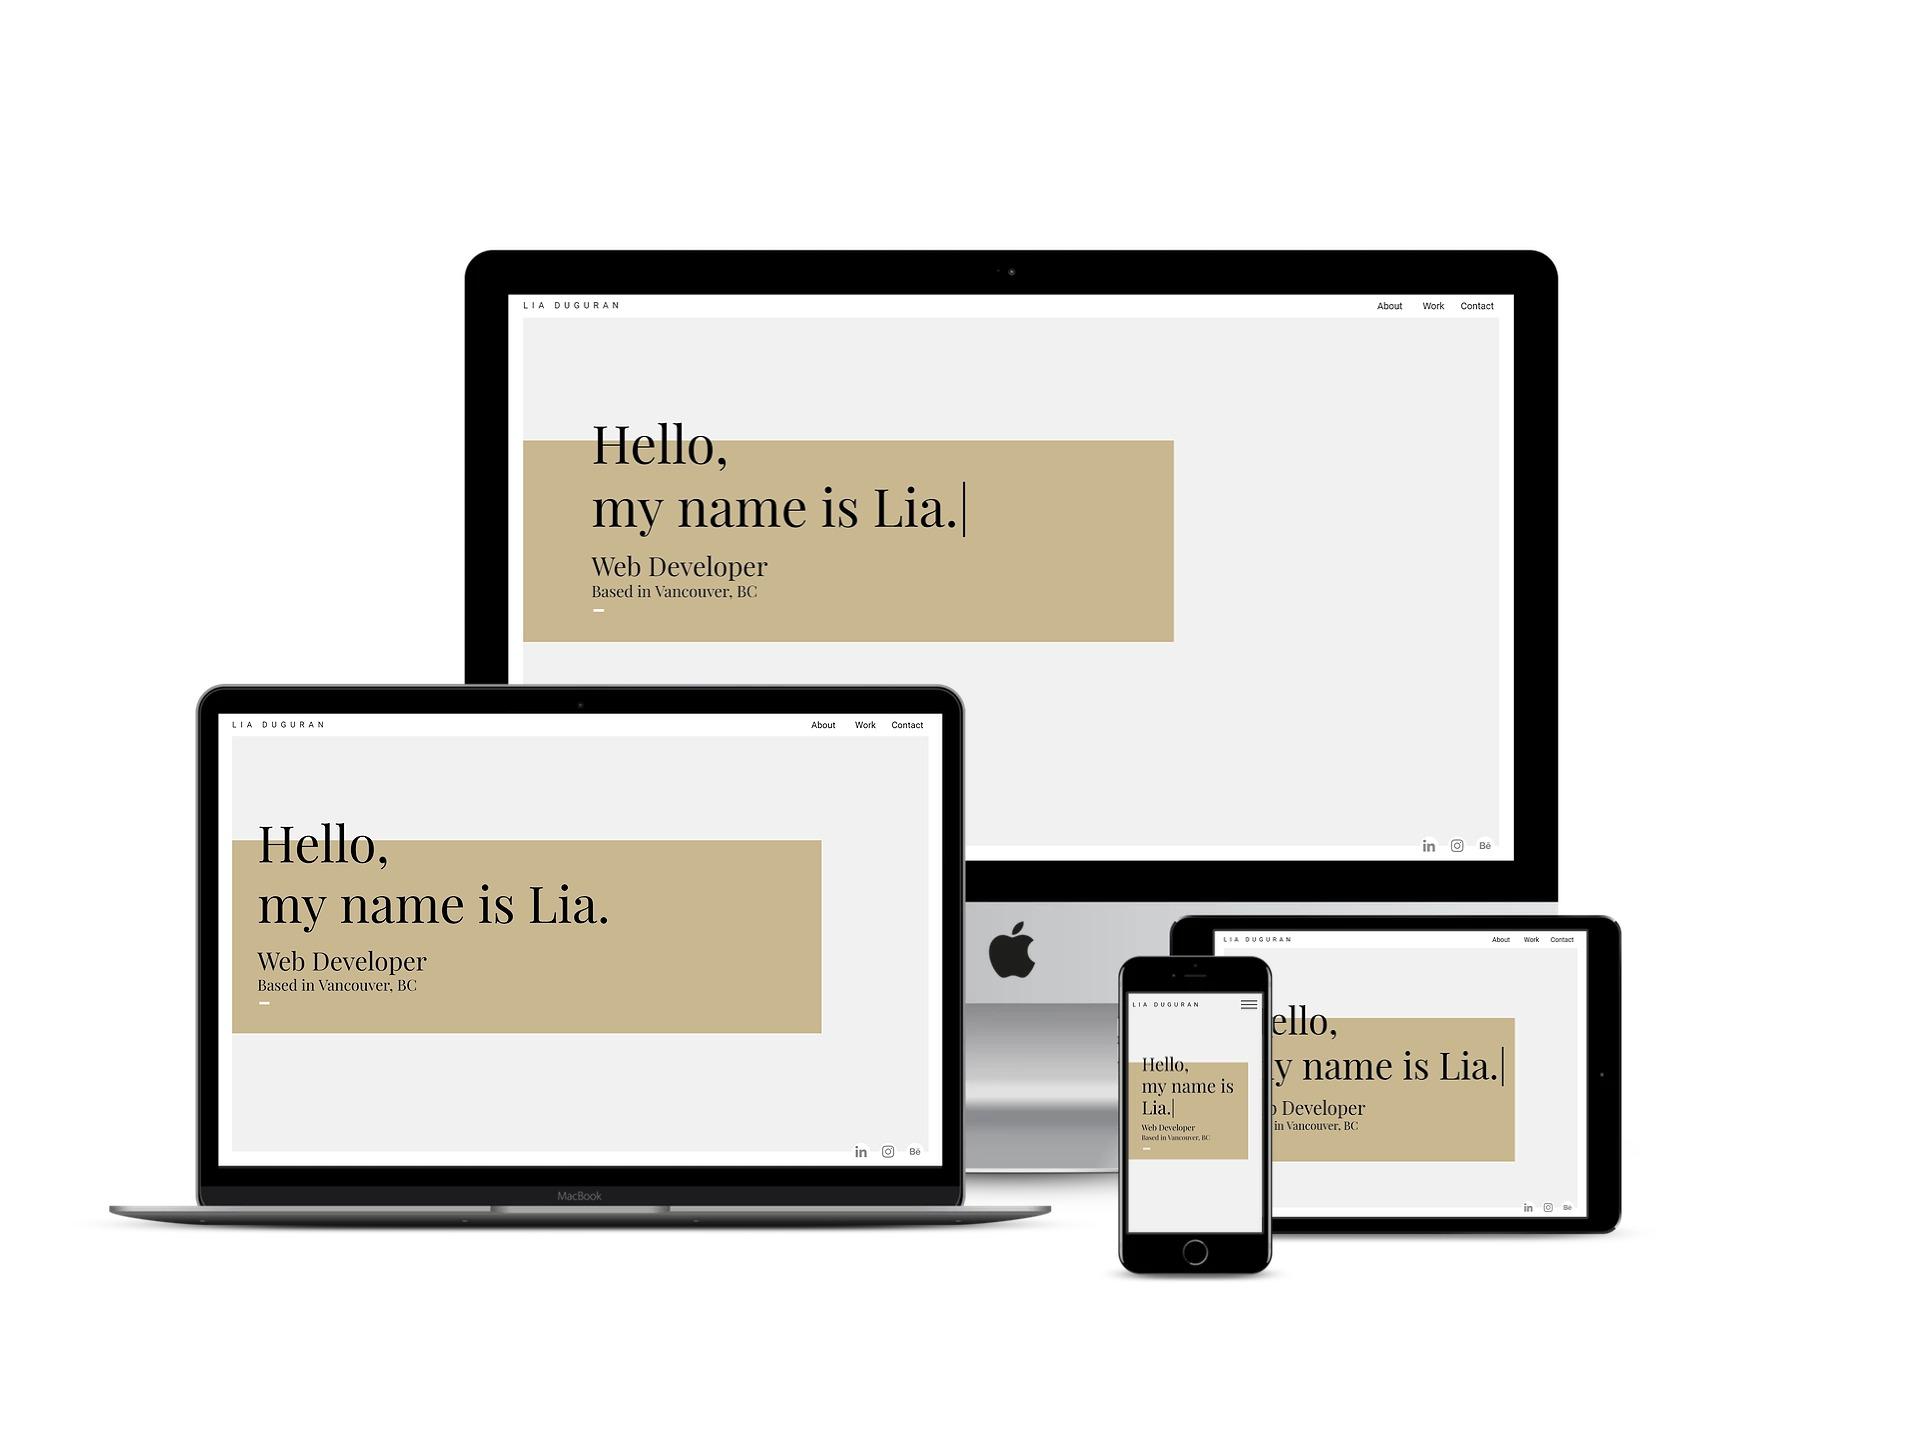 portfolio website, shown on multiple devices. Desktop, laptop, phone and tablet